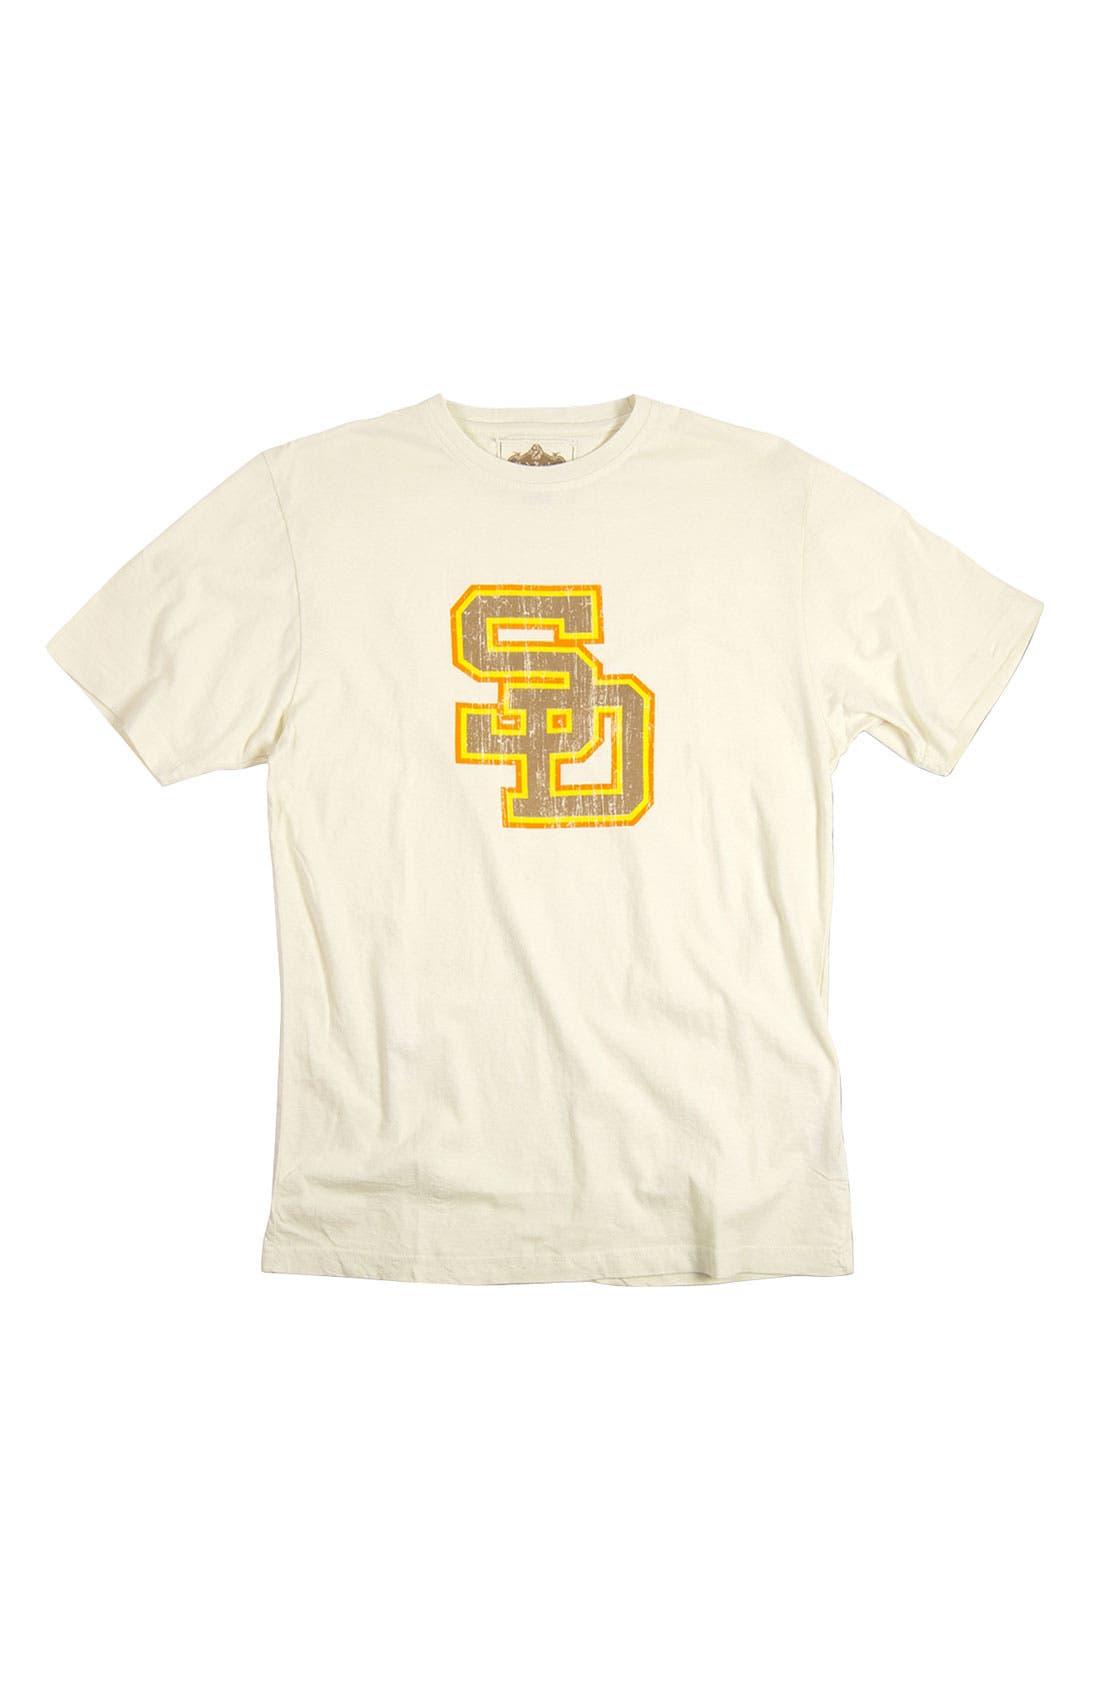 Alternate Image 1 Selected - Red Jacket 'San Diego Padres' Trim Fit T-Shirt (Men)